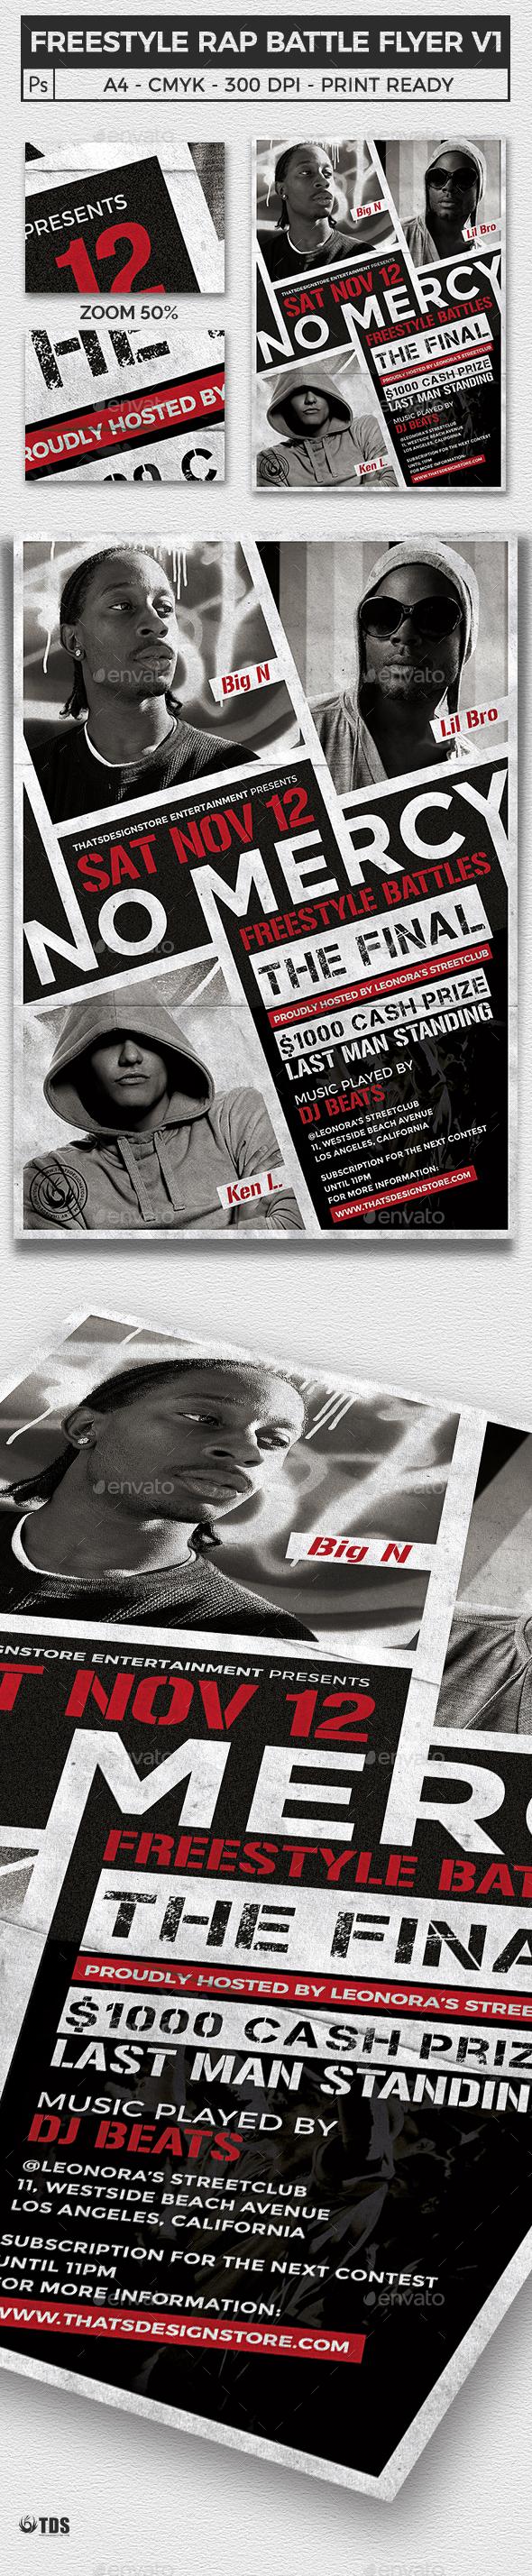 Freestyle Rap Battle Flyer Template V1 - Clubs & Parties Events